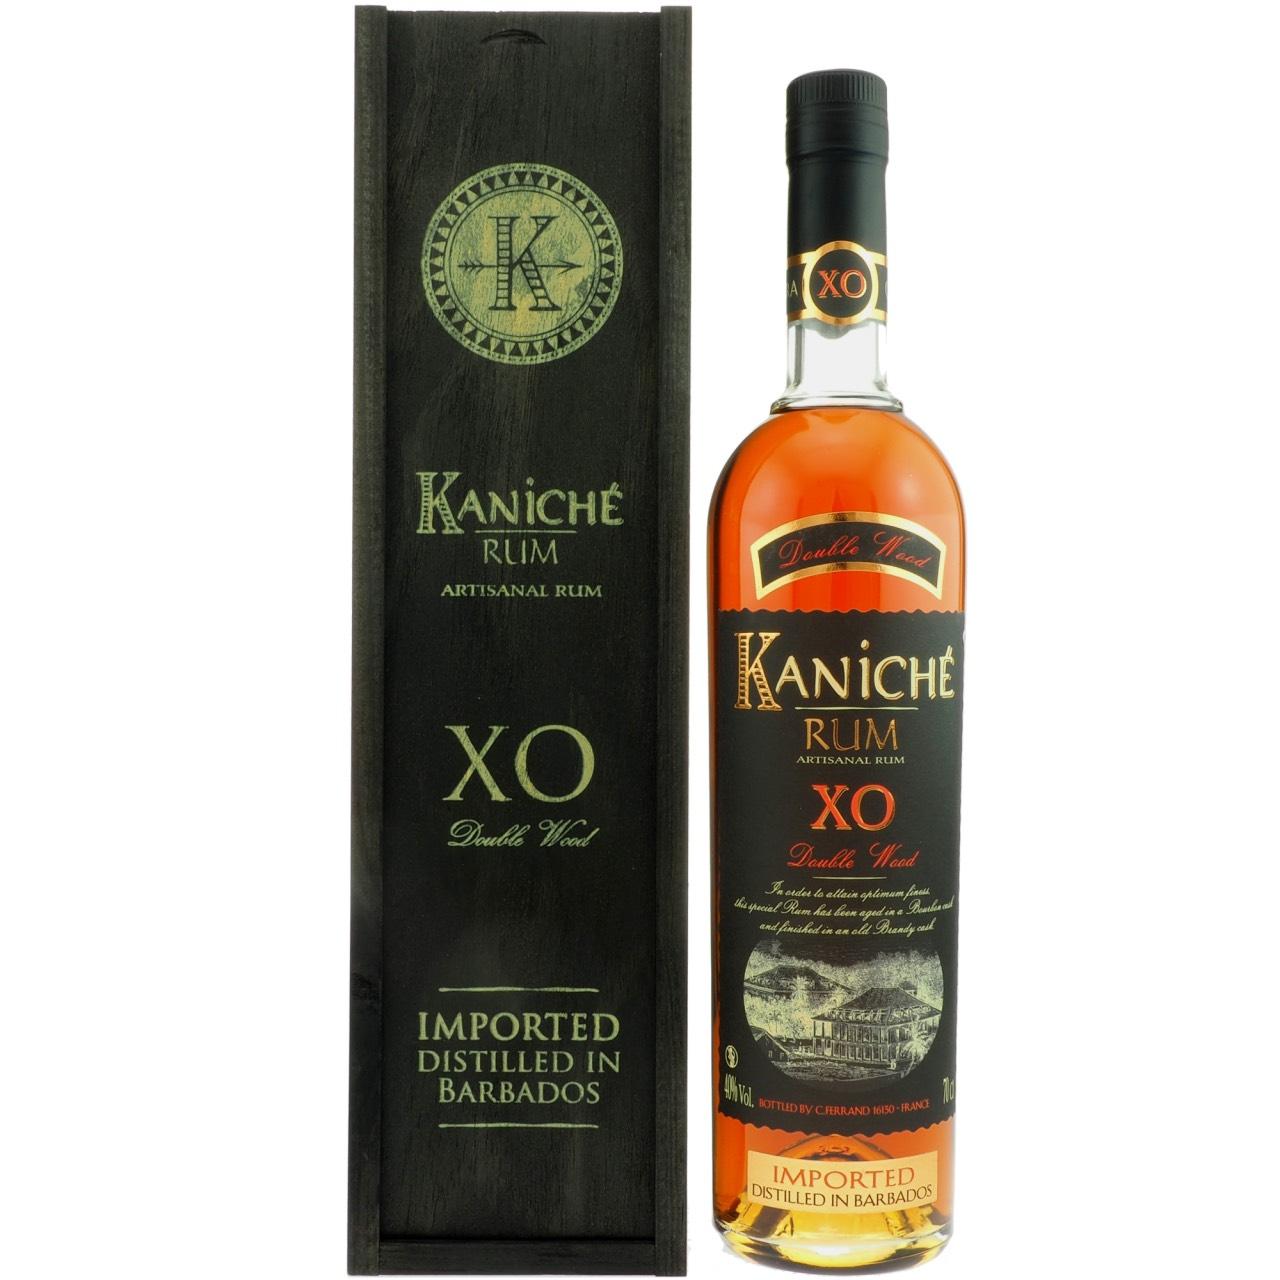 Bottle image of Kaniché Double Wood XO